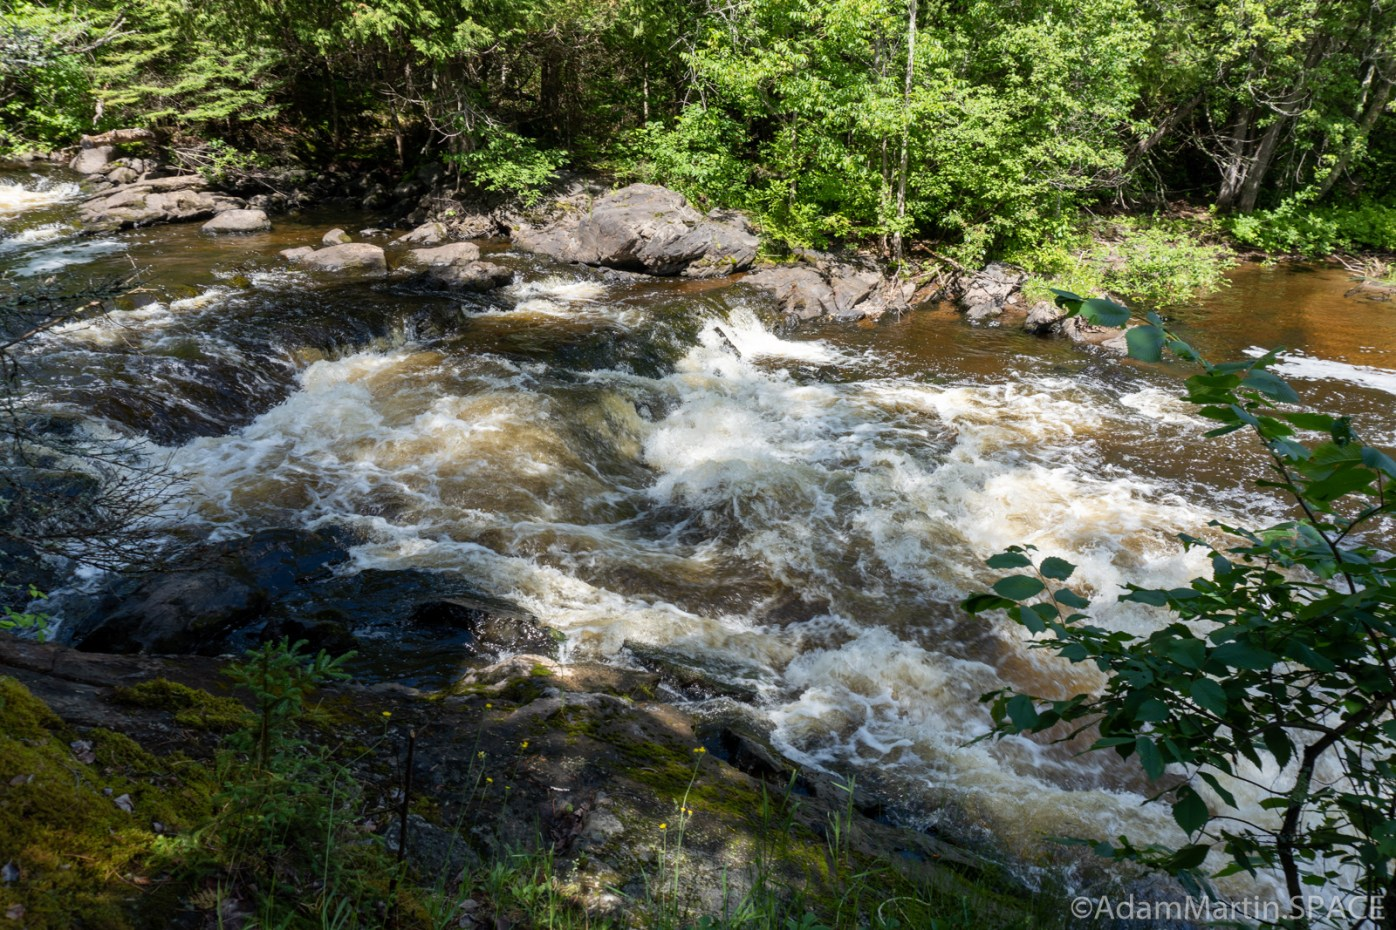 Washburn Falls - Lower falls section